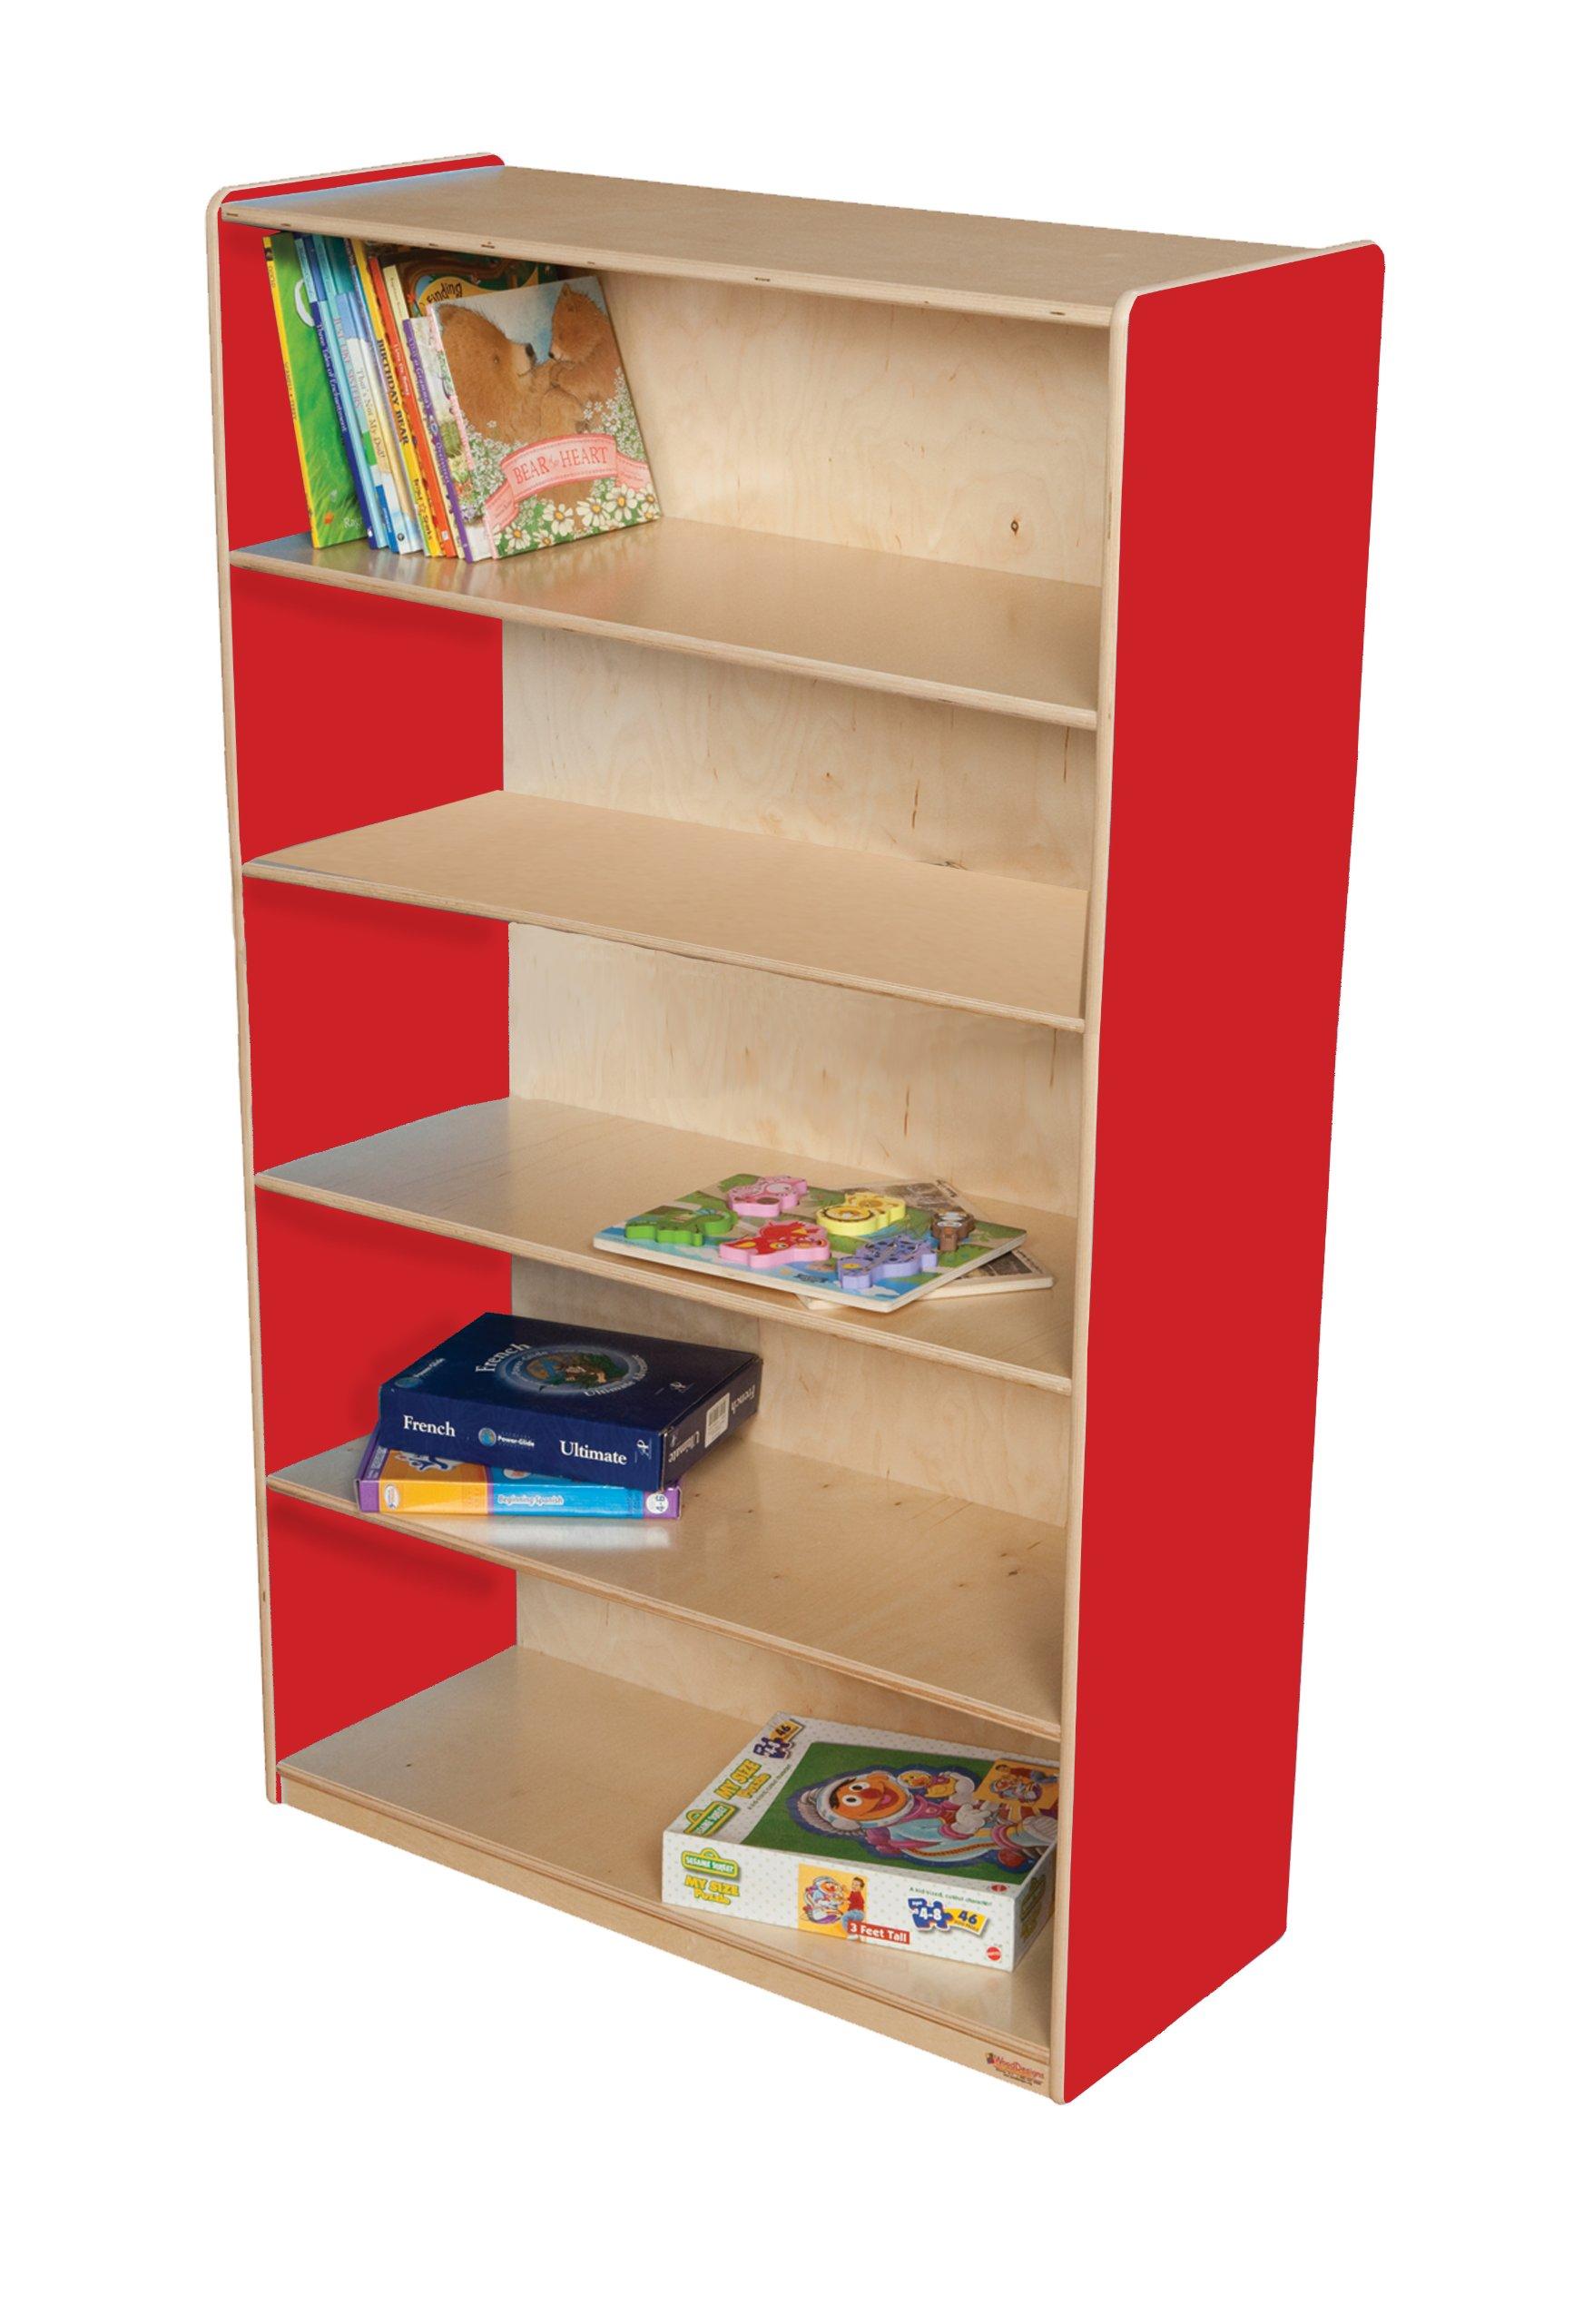 Wood Designs WD12960R Bookshelf, 60 x 36 x 15'' (H x W x D), Strawberry Red Color